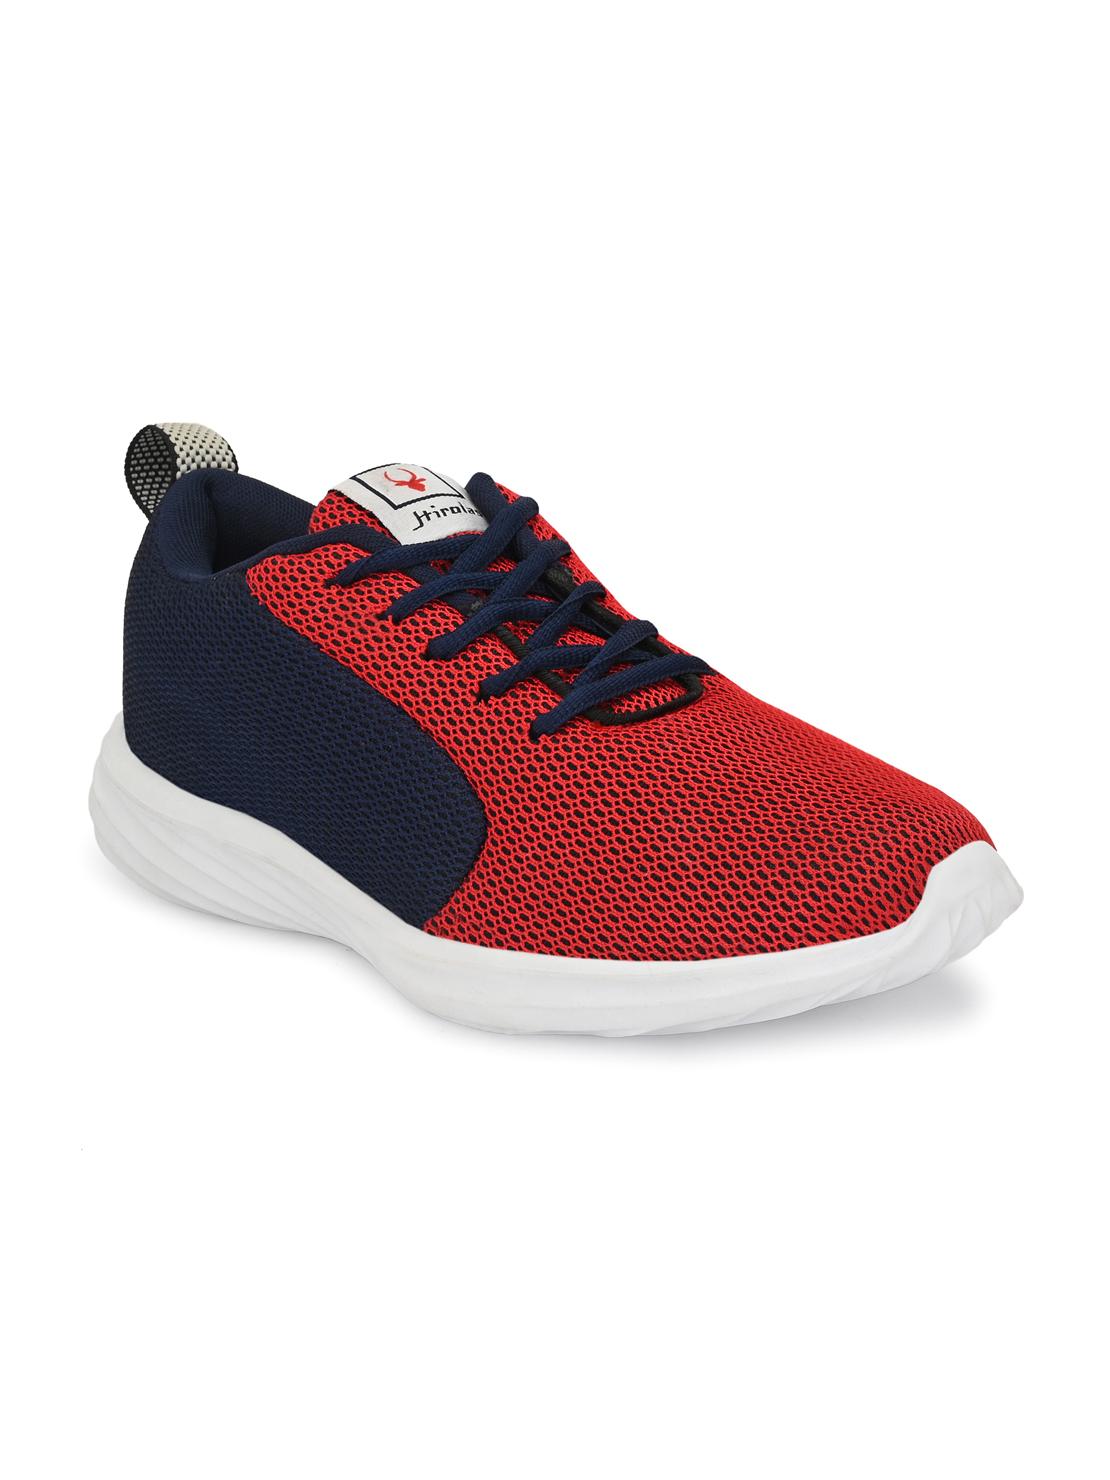 Hirolas   Hirolas Men's Mesh Blue/Red Running/Walking/Gym Sports Sneaker Shoes